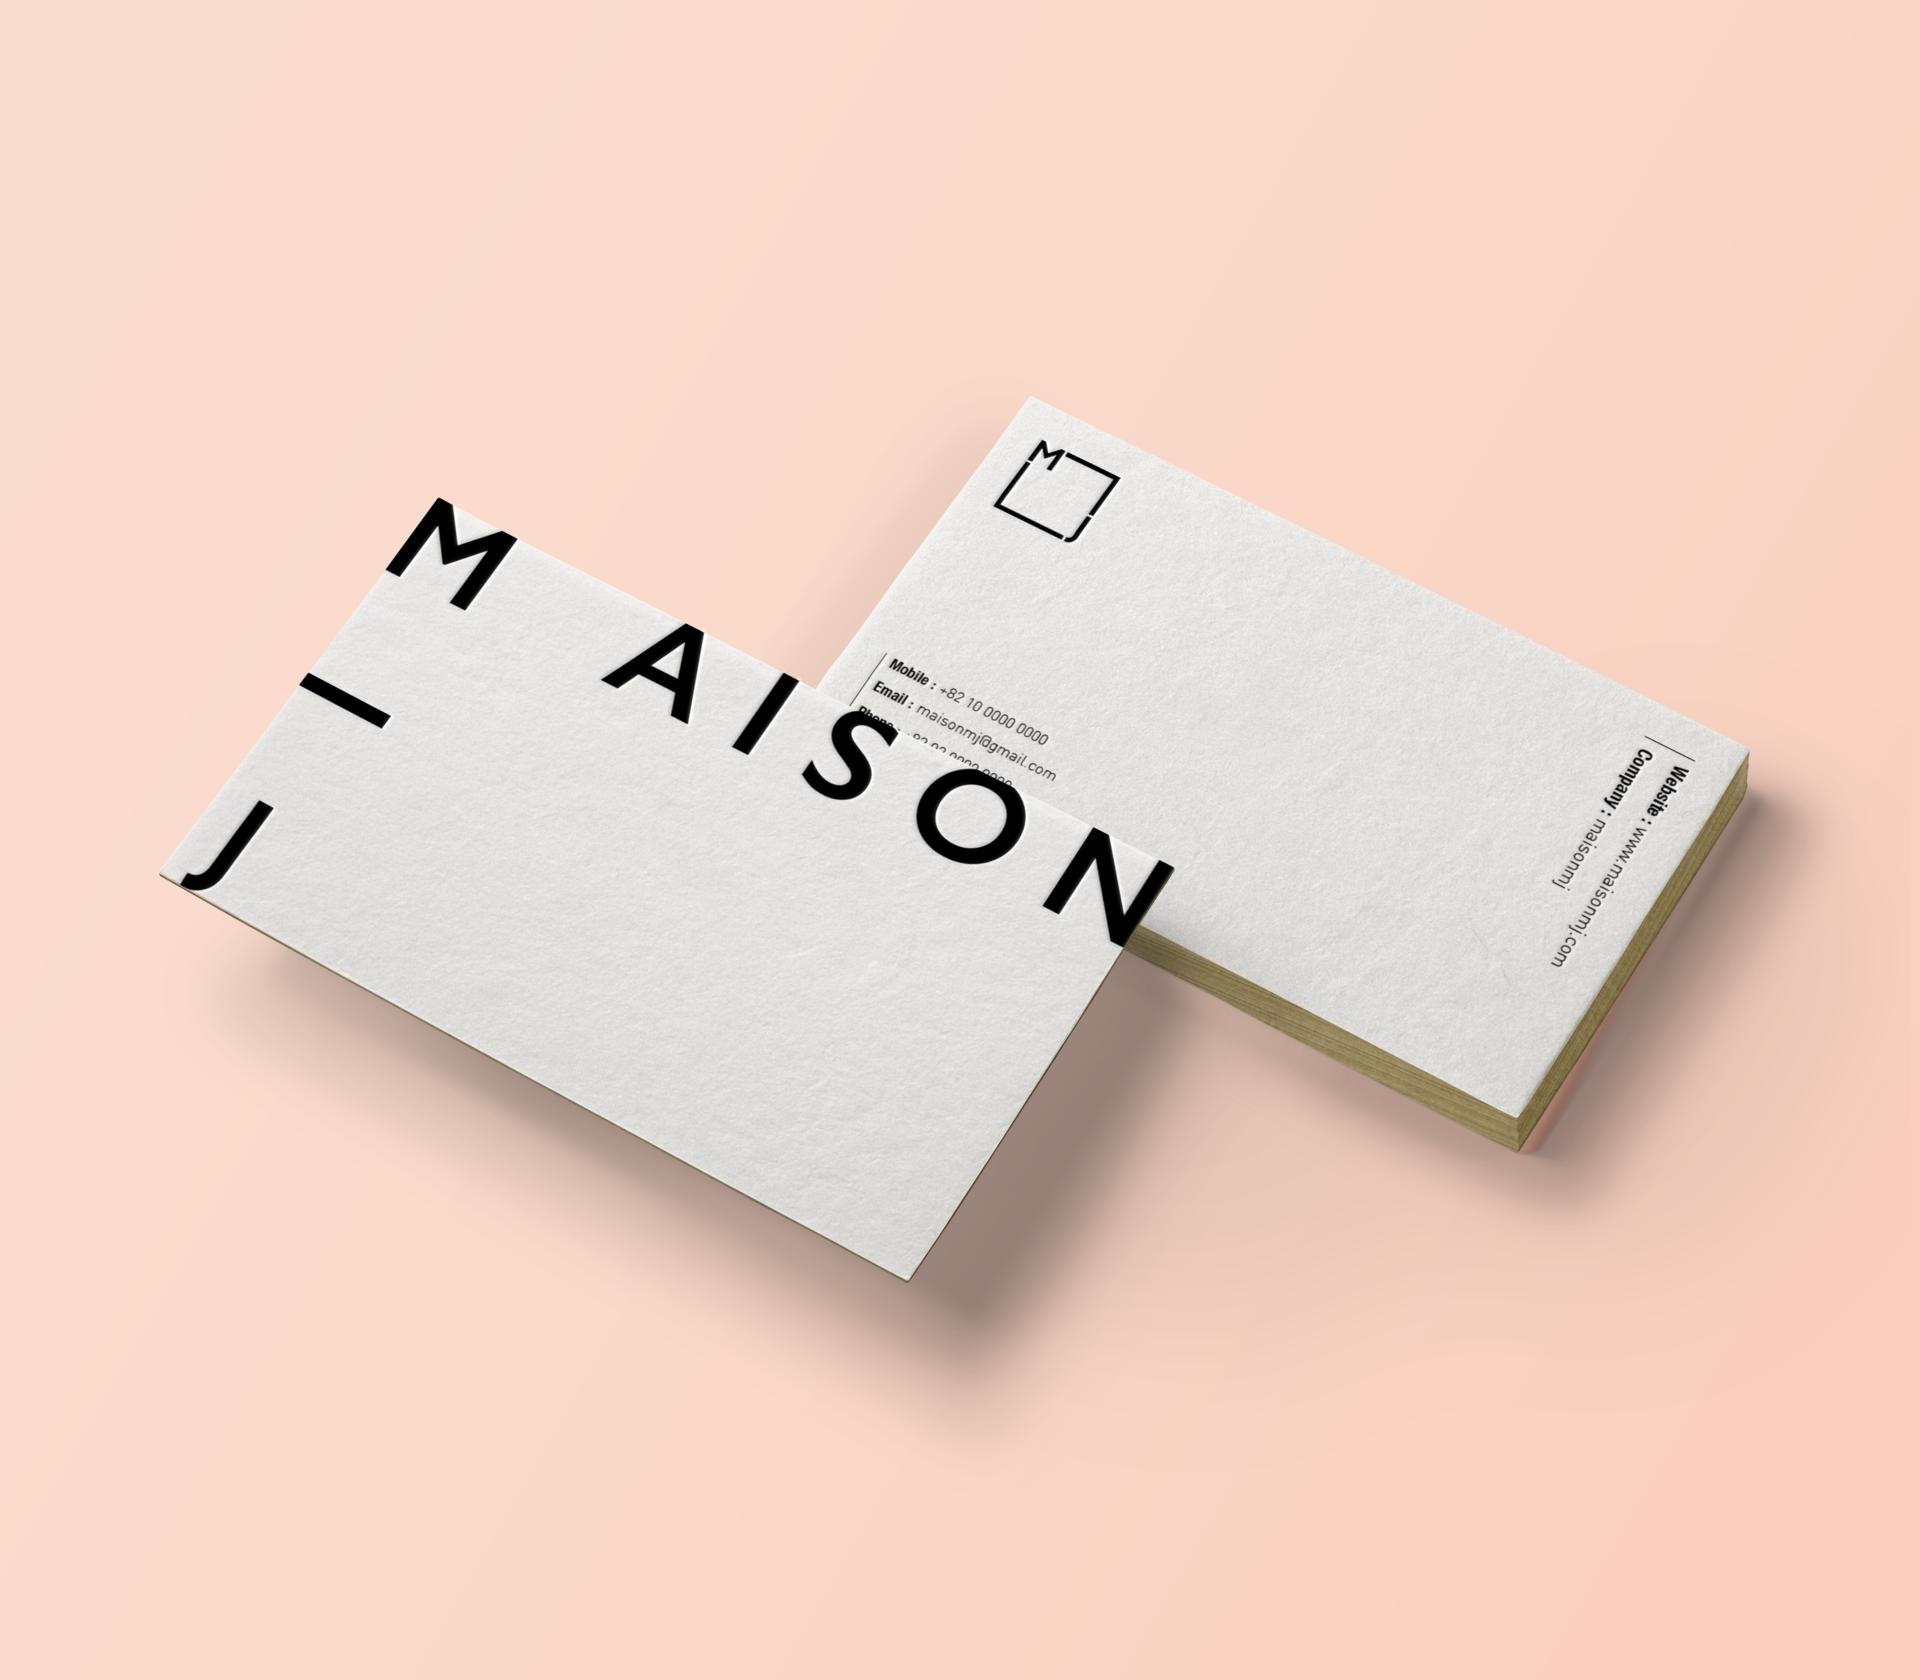 MAISON MJ / Identity Design